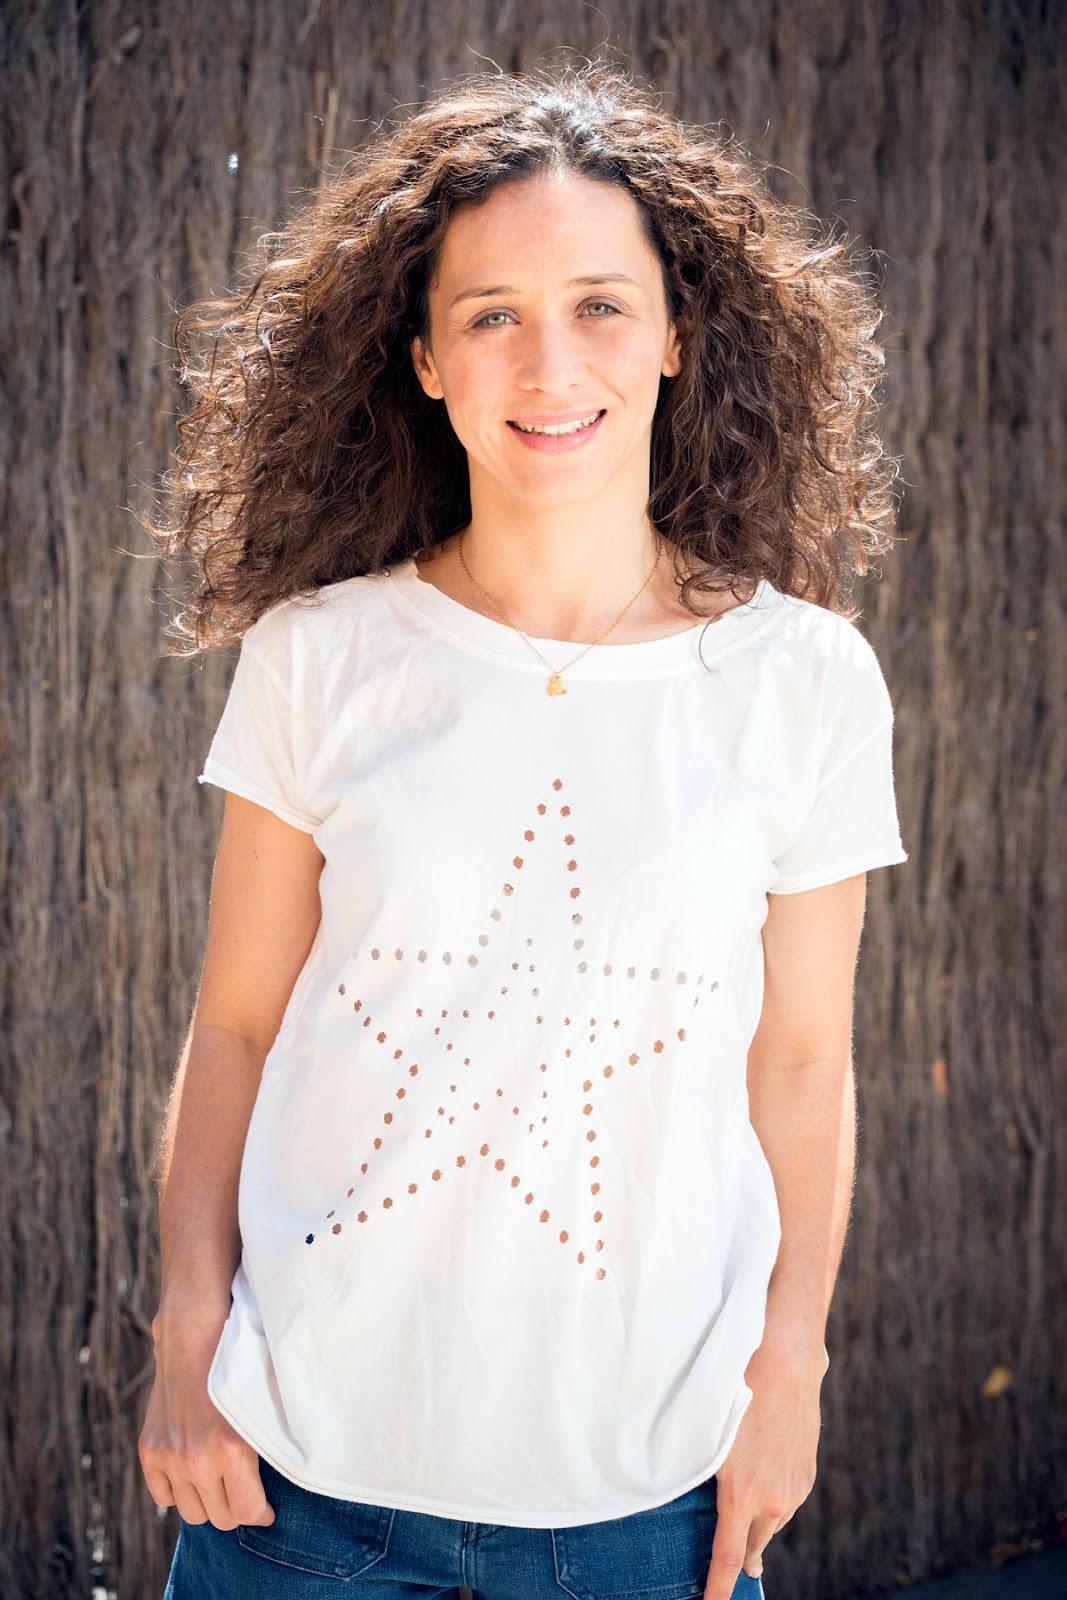 http://2.bp.blogspot.com/-L-_jU4pWo7Y/T94i1p0OknI/AAAAAAAAA90/No9DBjnQeU4/s1600/Alicia+Camiseta+estrellada.jpg